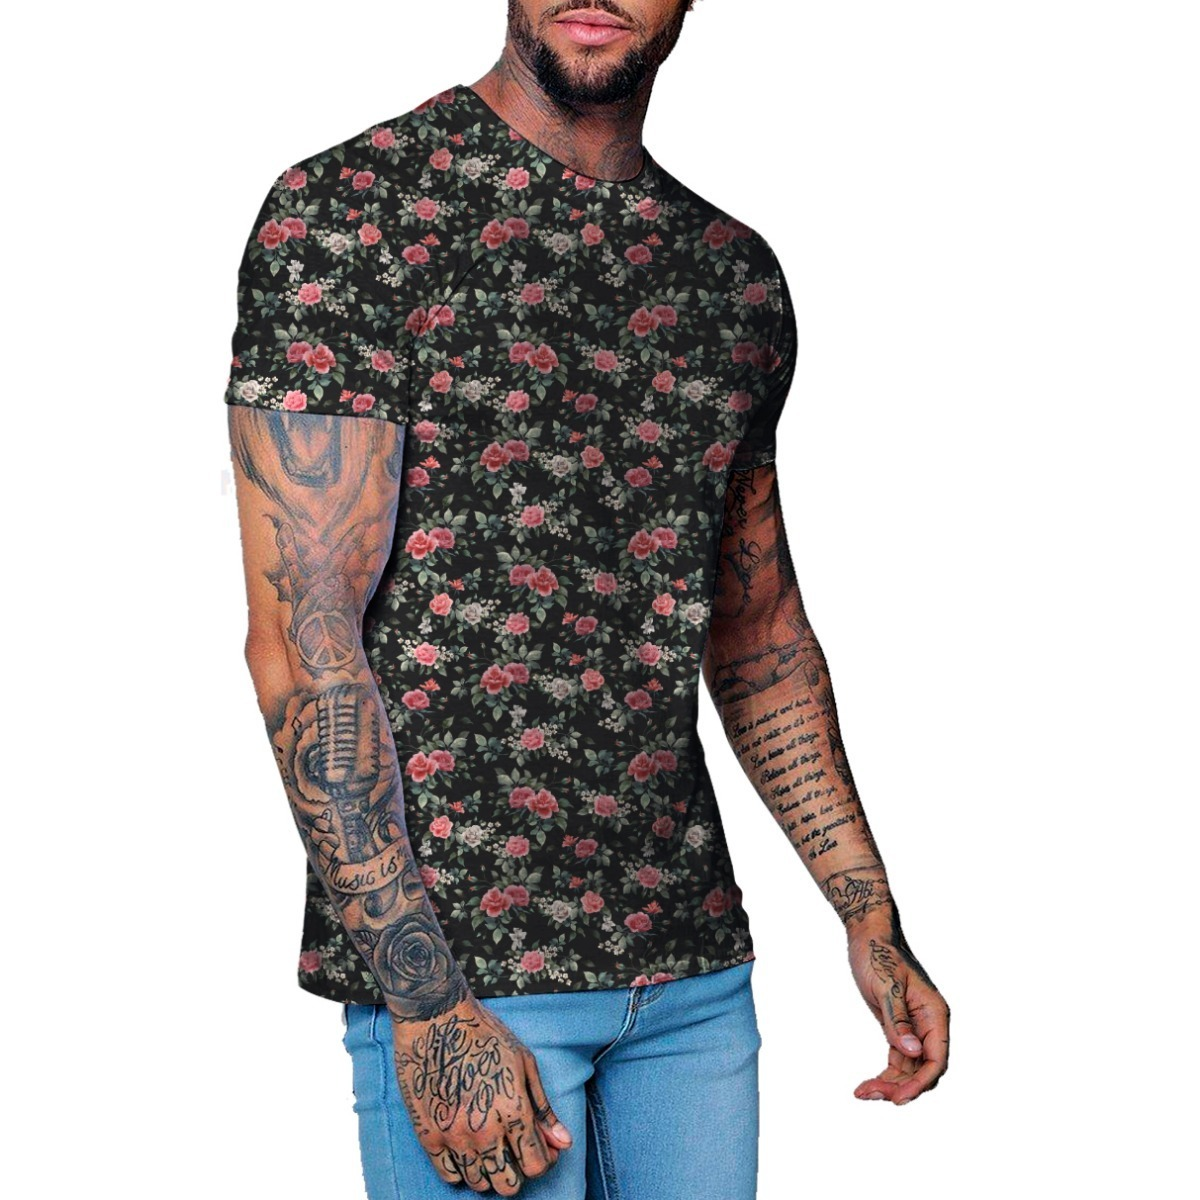 08f0a7b604 camiseta masculina florida estampada vintage floral flor 635. Carregando  zoom.